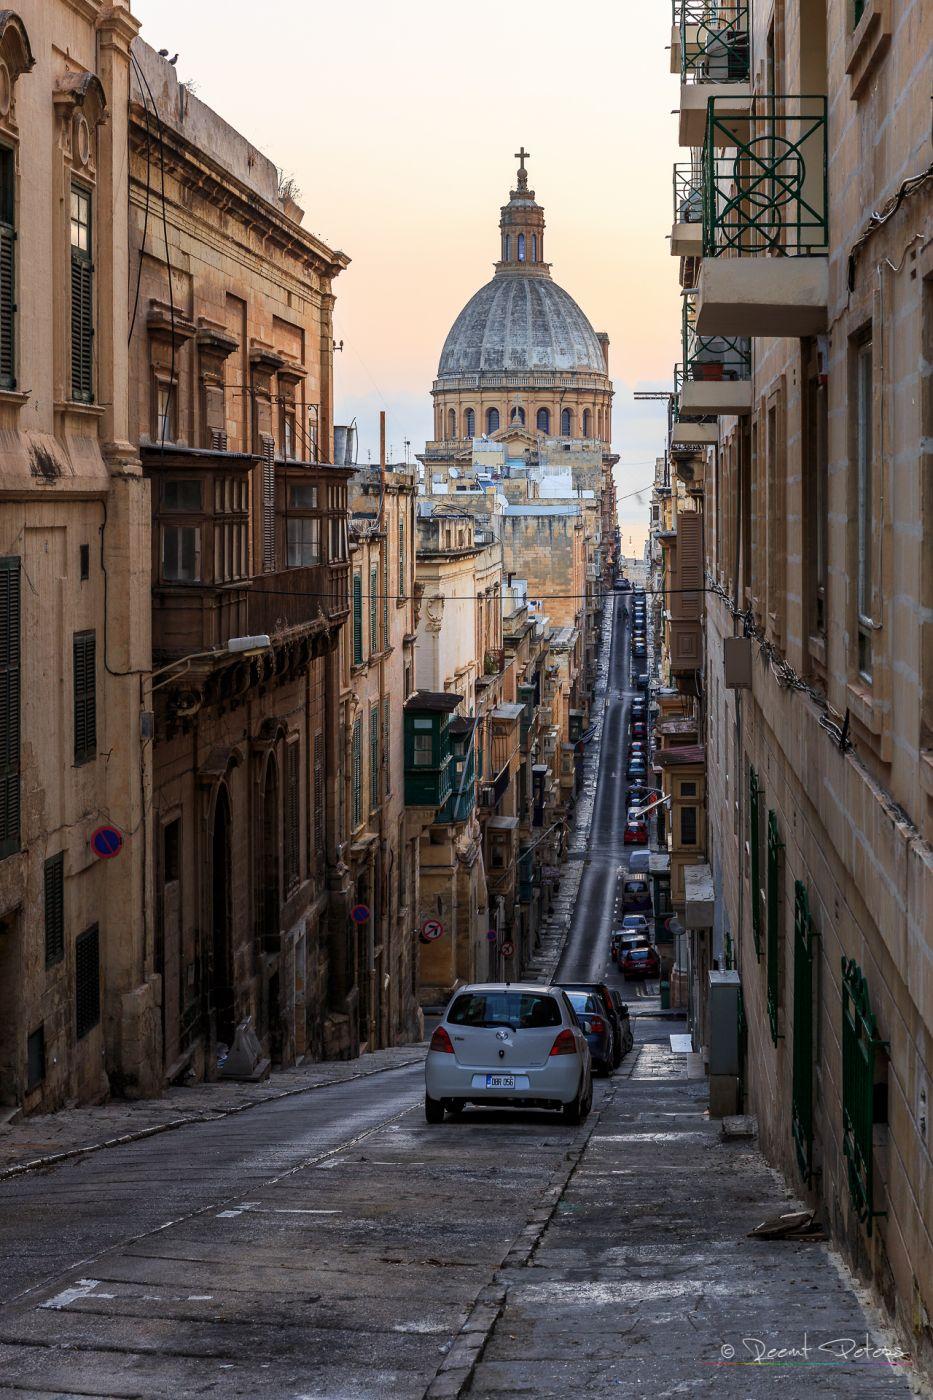 Basilica of Our Lady of Mount Carmel, Malta